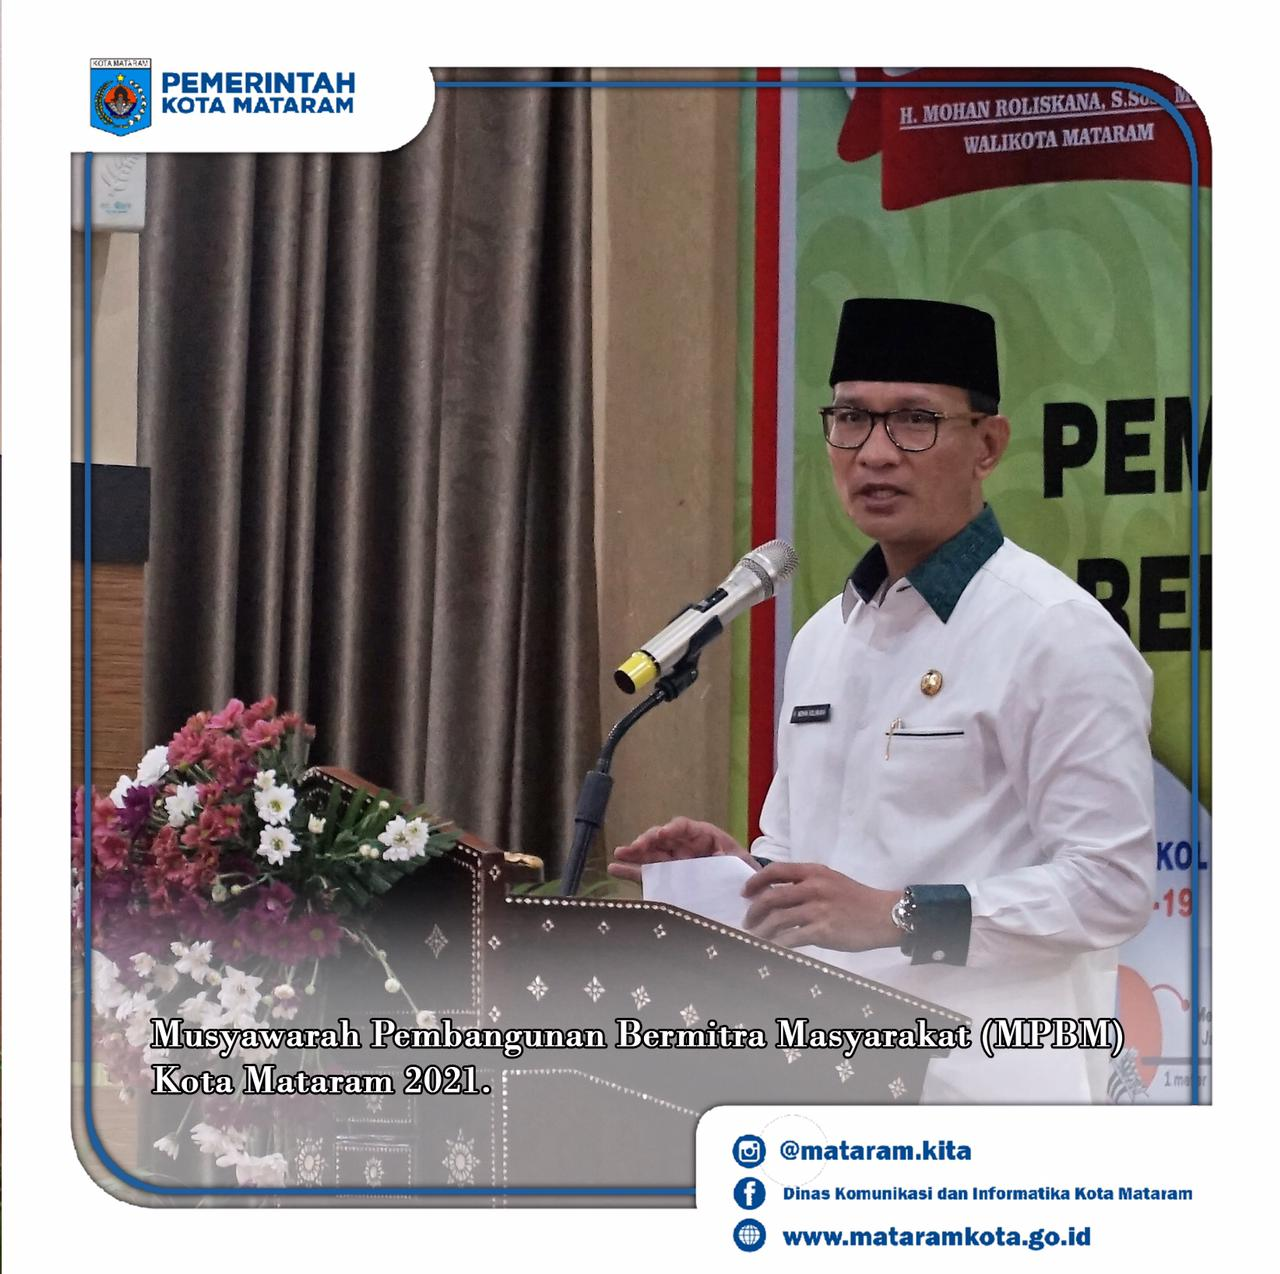 Wali Kota Buka Musyawarah Pembangunan Bermitra Masyarakat (MPBM) Tahun 2022